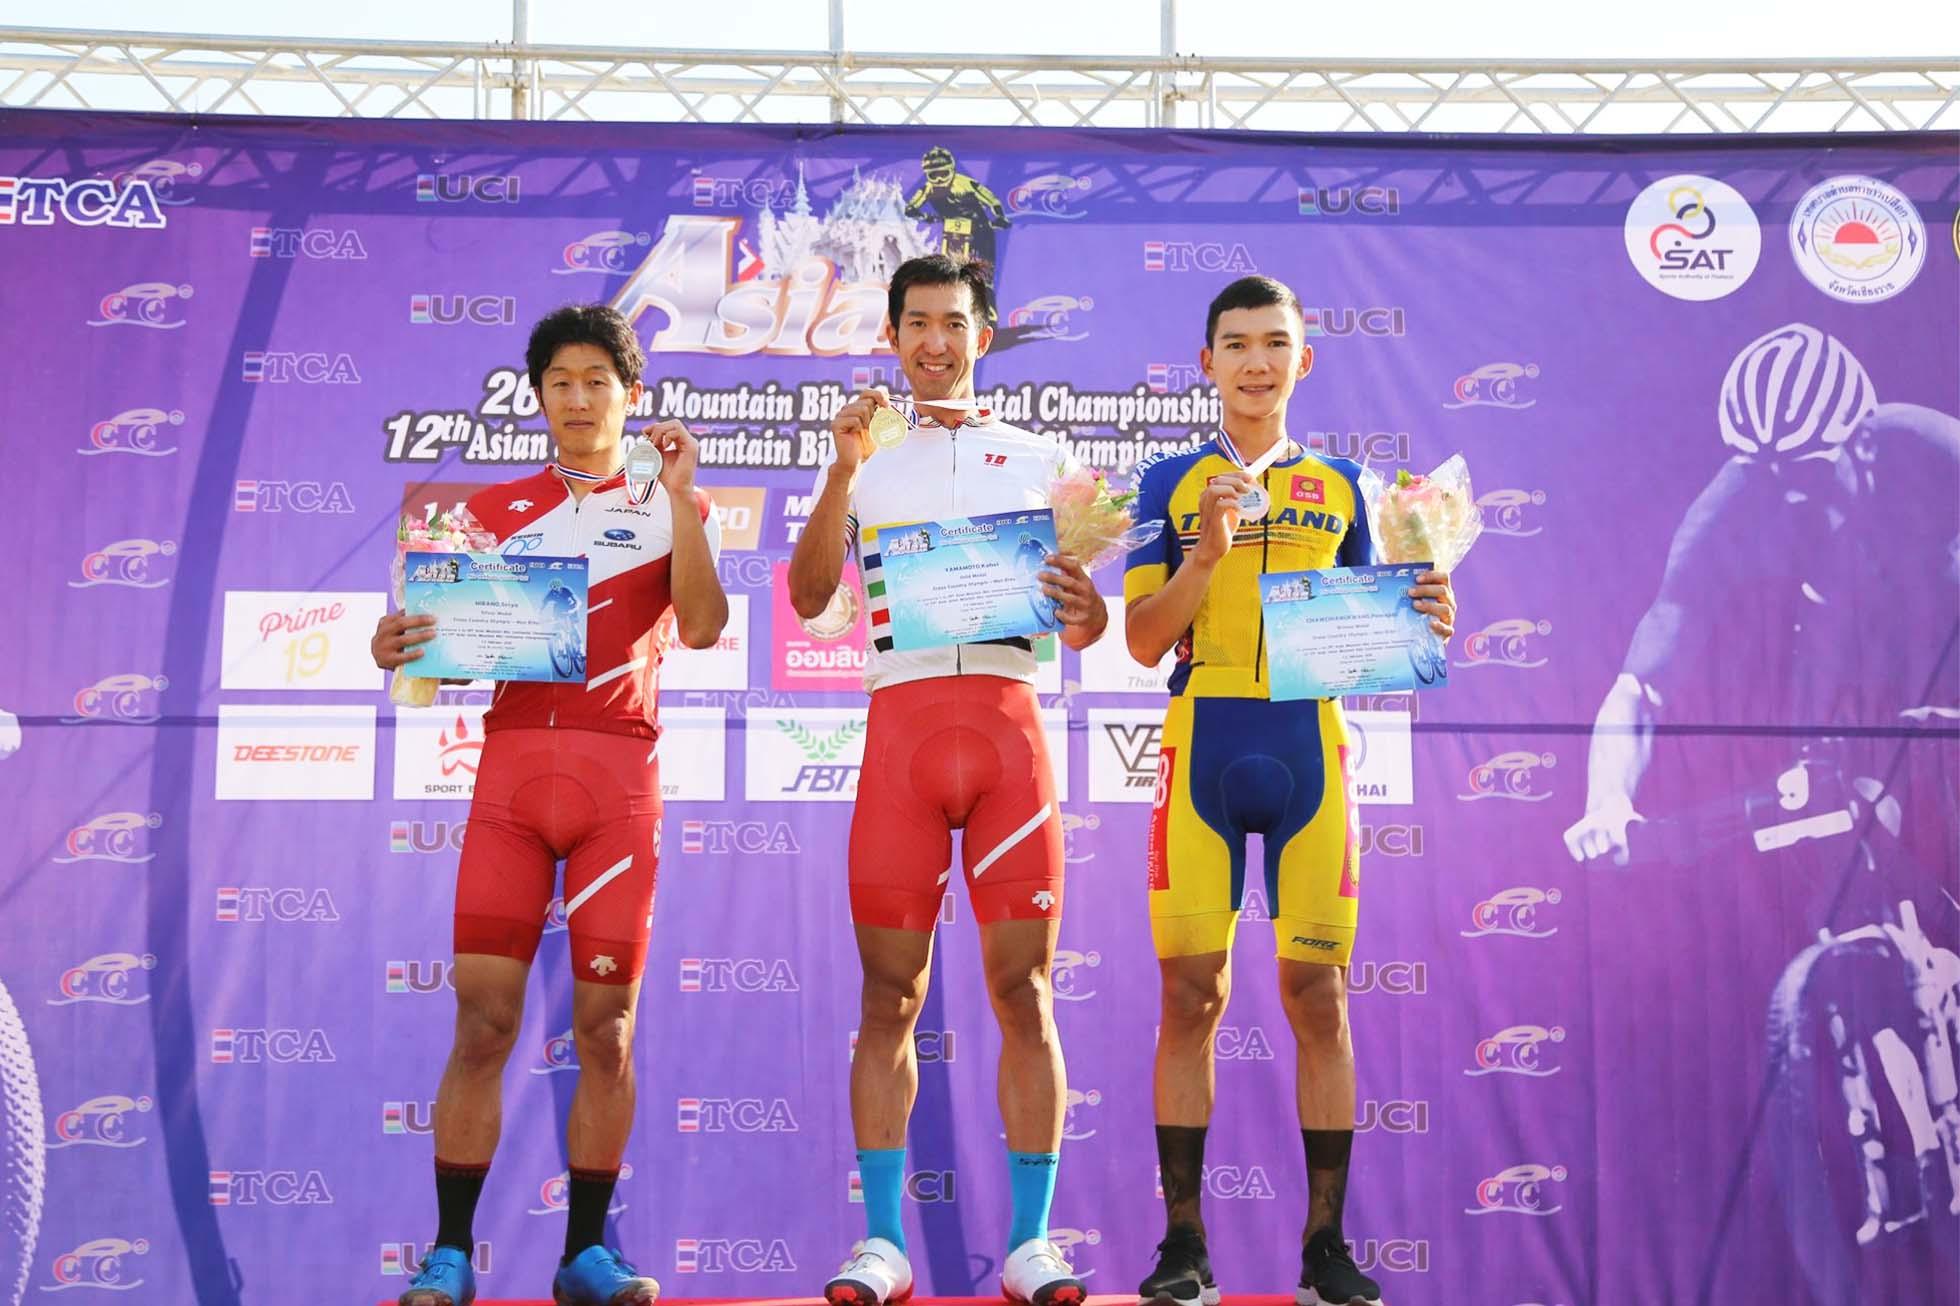 MTBアジア選手権 JCF 山本幸平(1位), 平野星矢(2位)